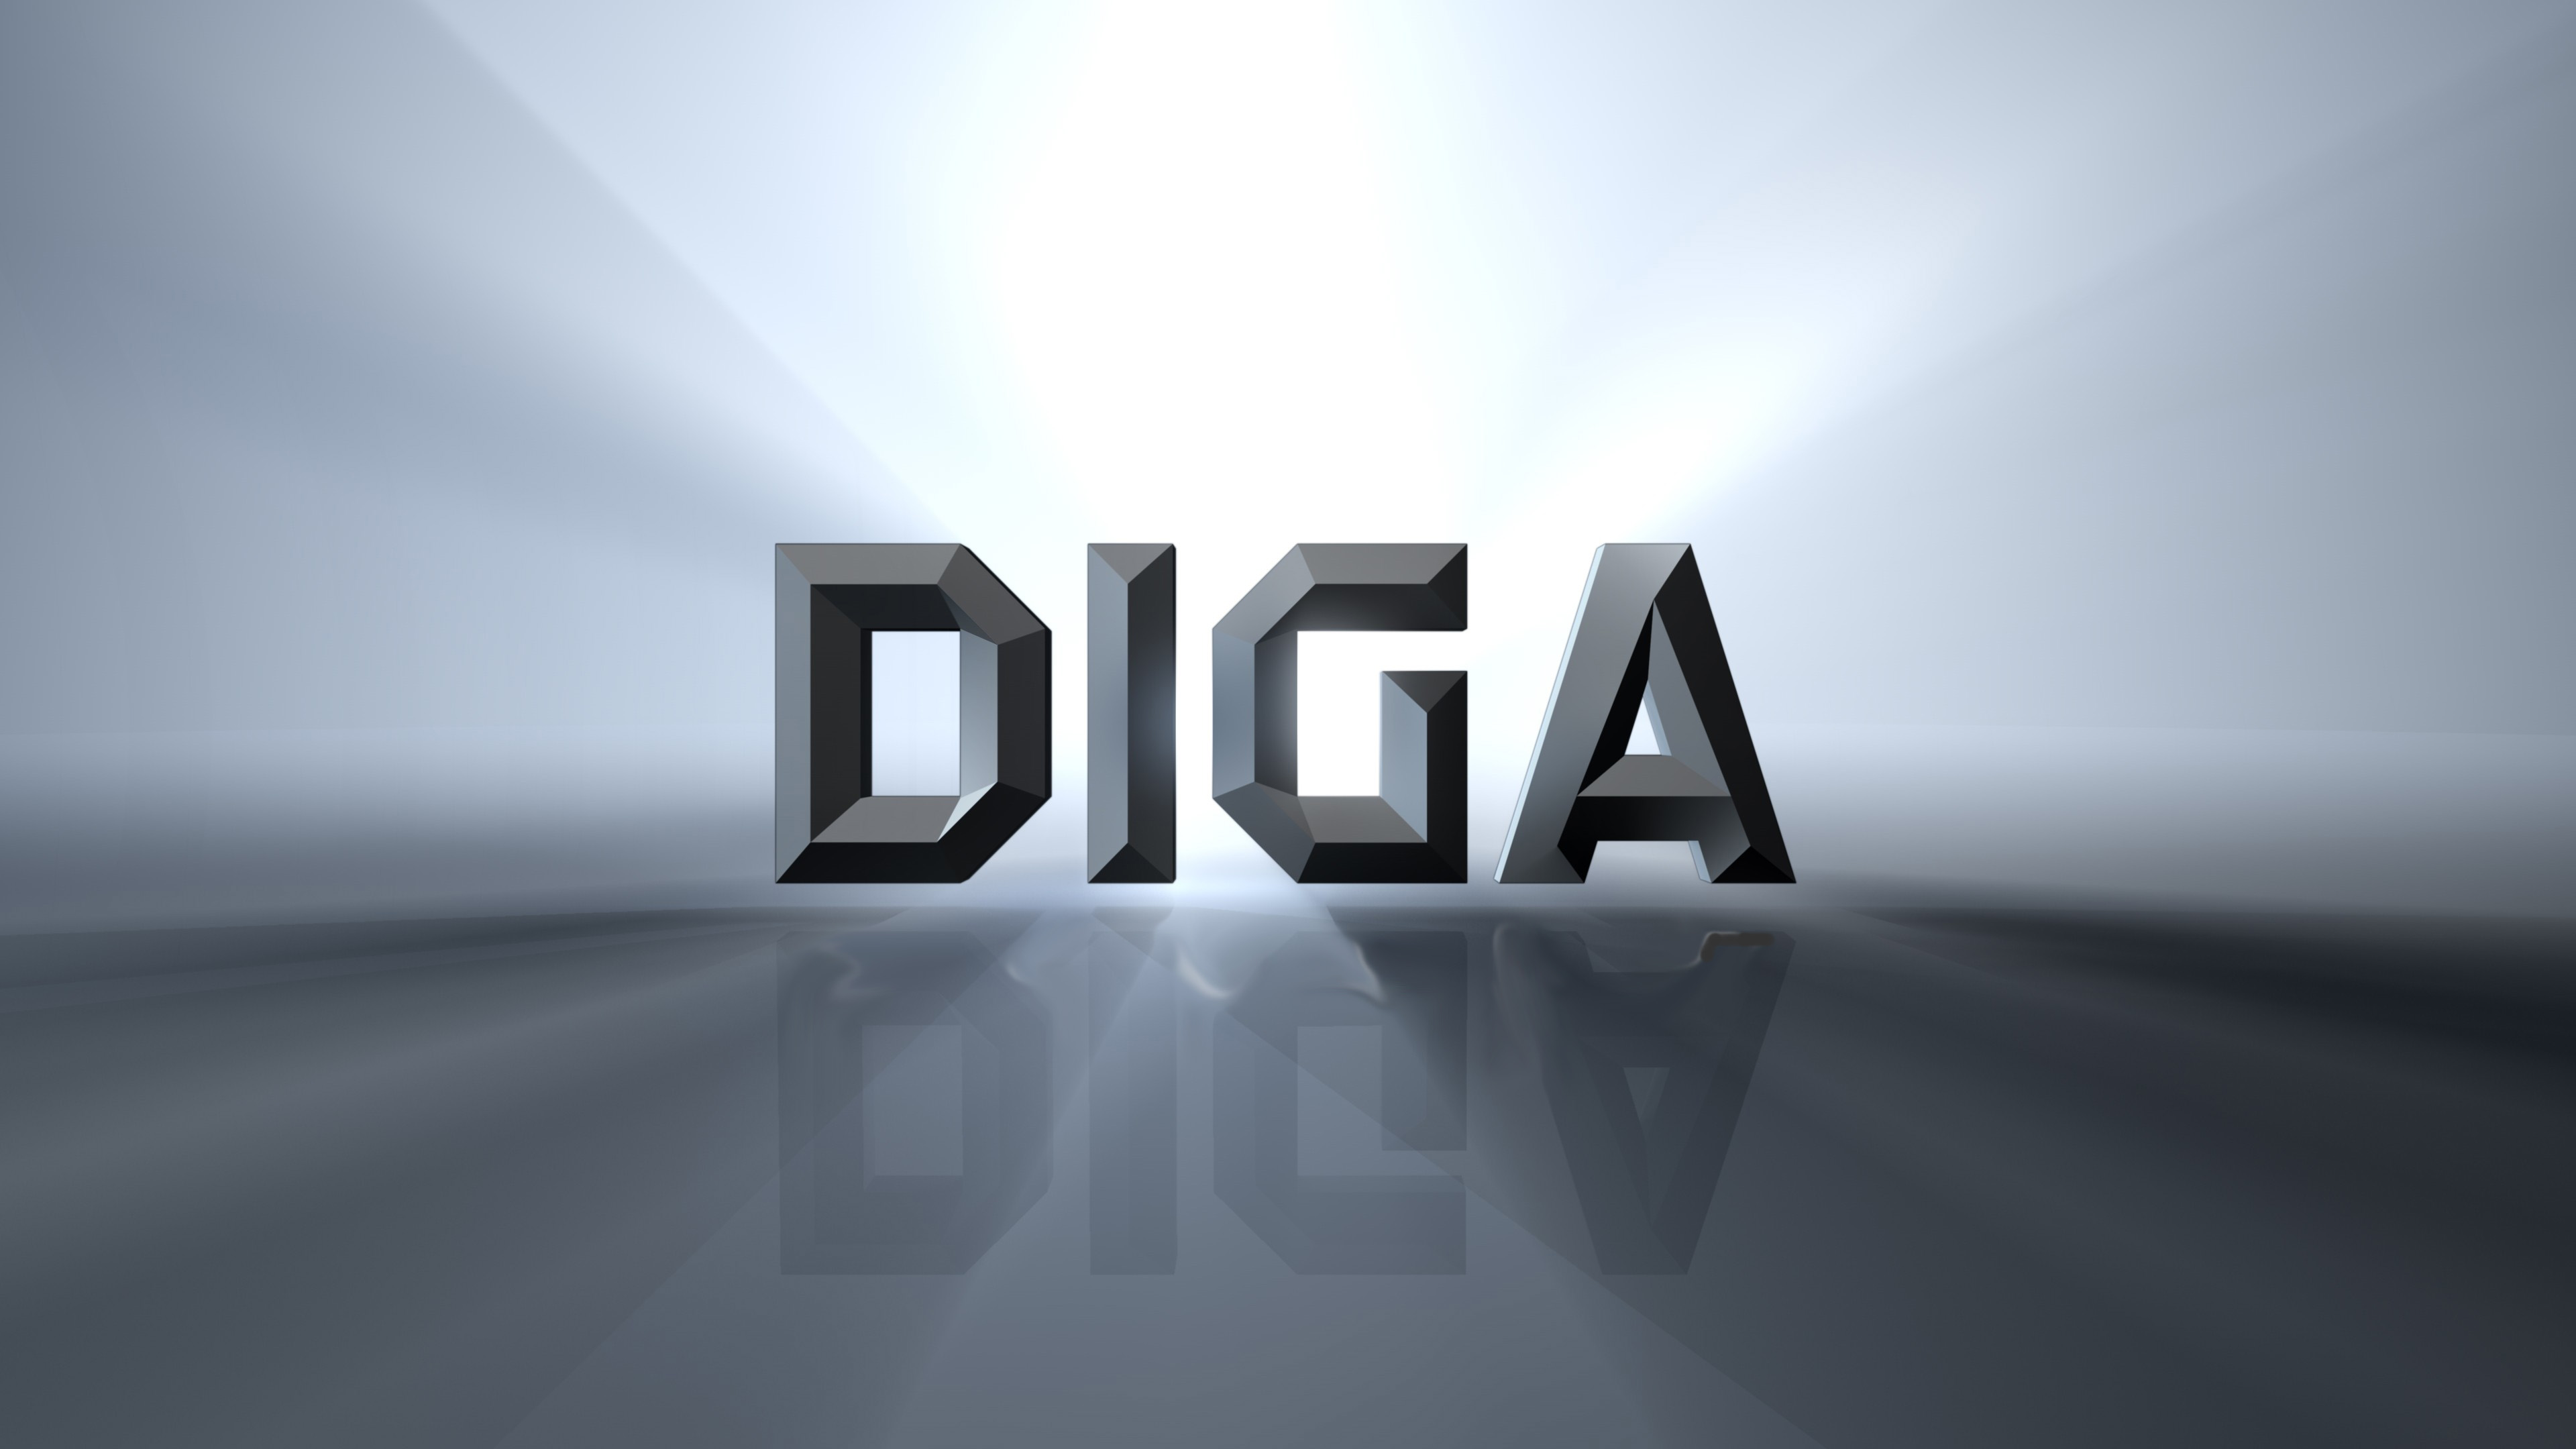 Diga_logo_-_no_vision__1_